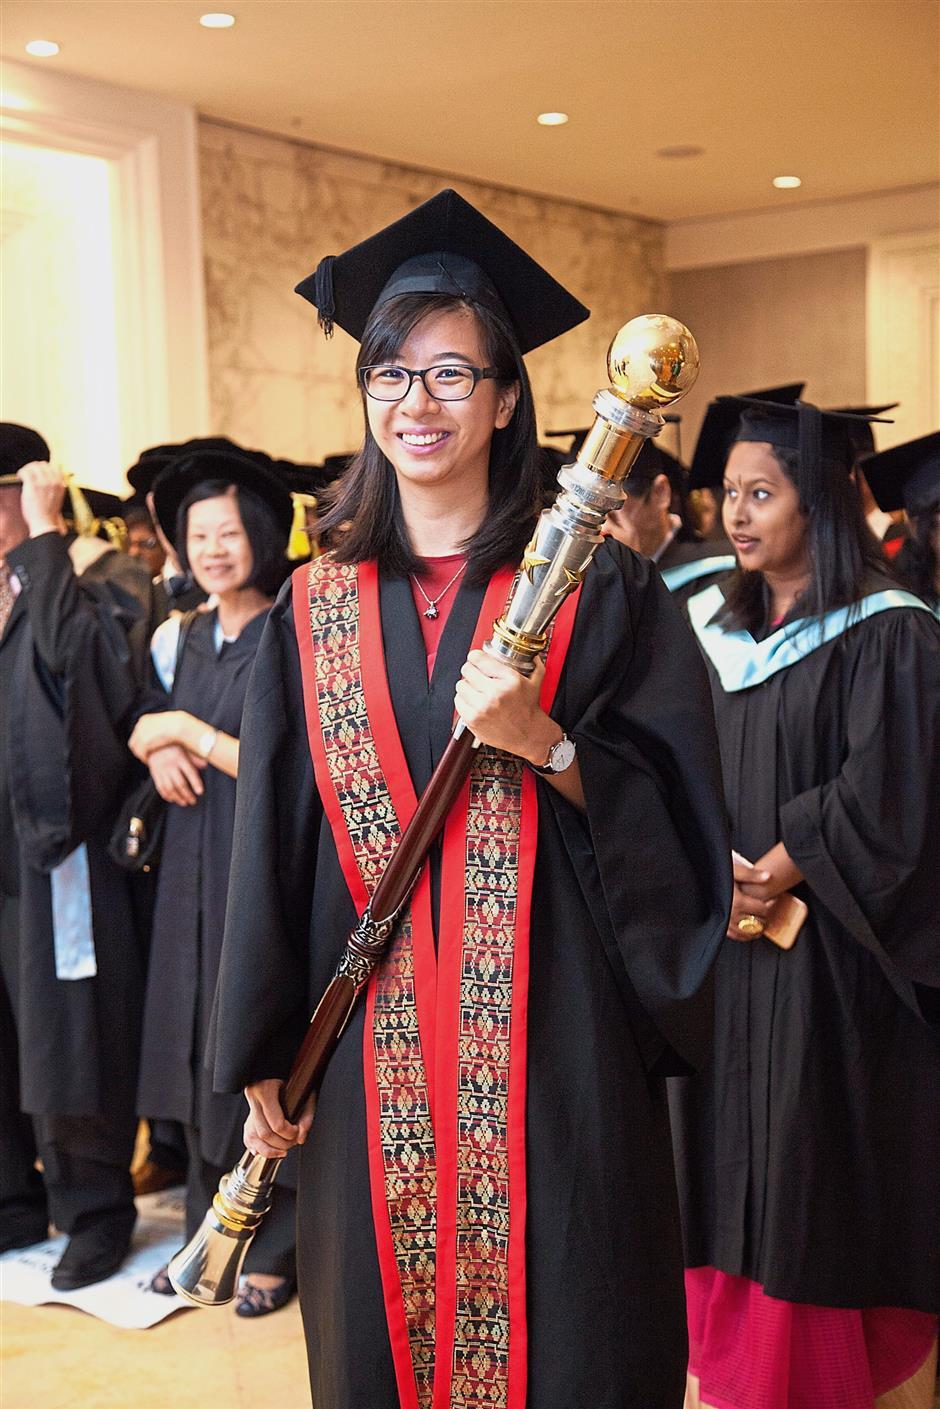 Hwu is the valedictorian and recipient of the Tan Sri Datuk Paduka Dr Hajjah Saleha Outstanding Achievement Award.